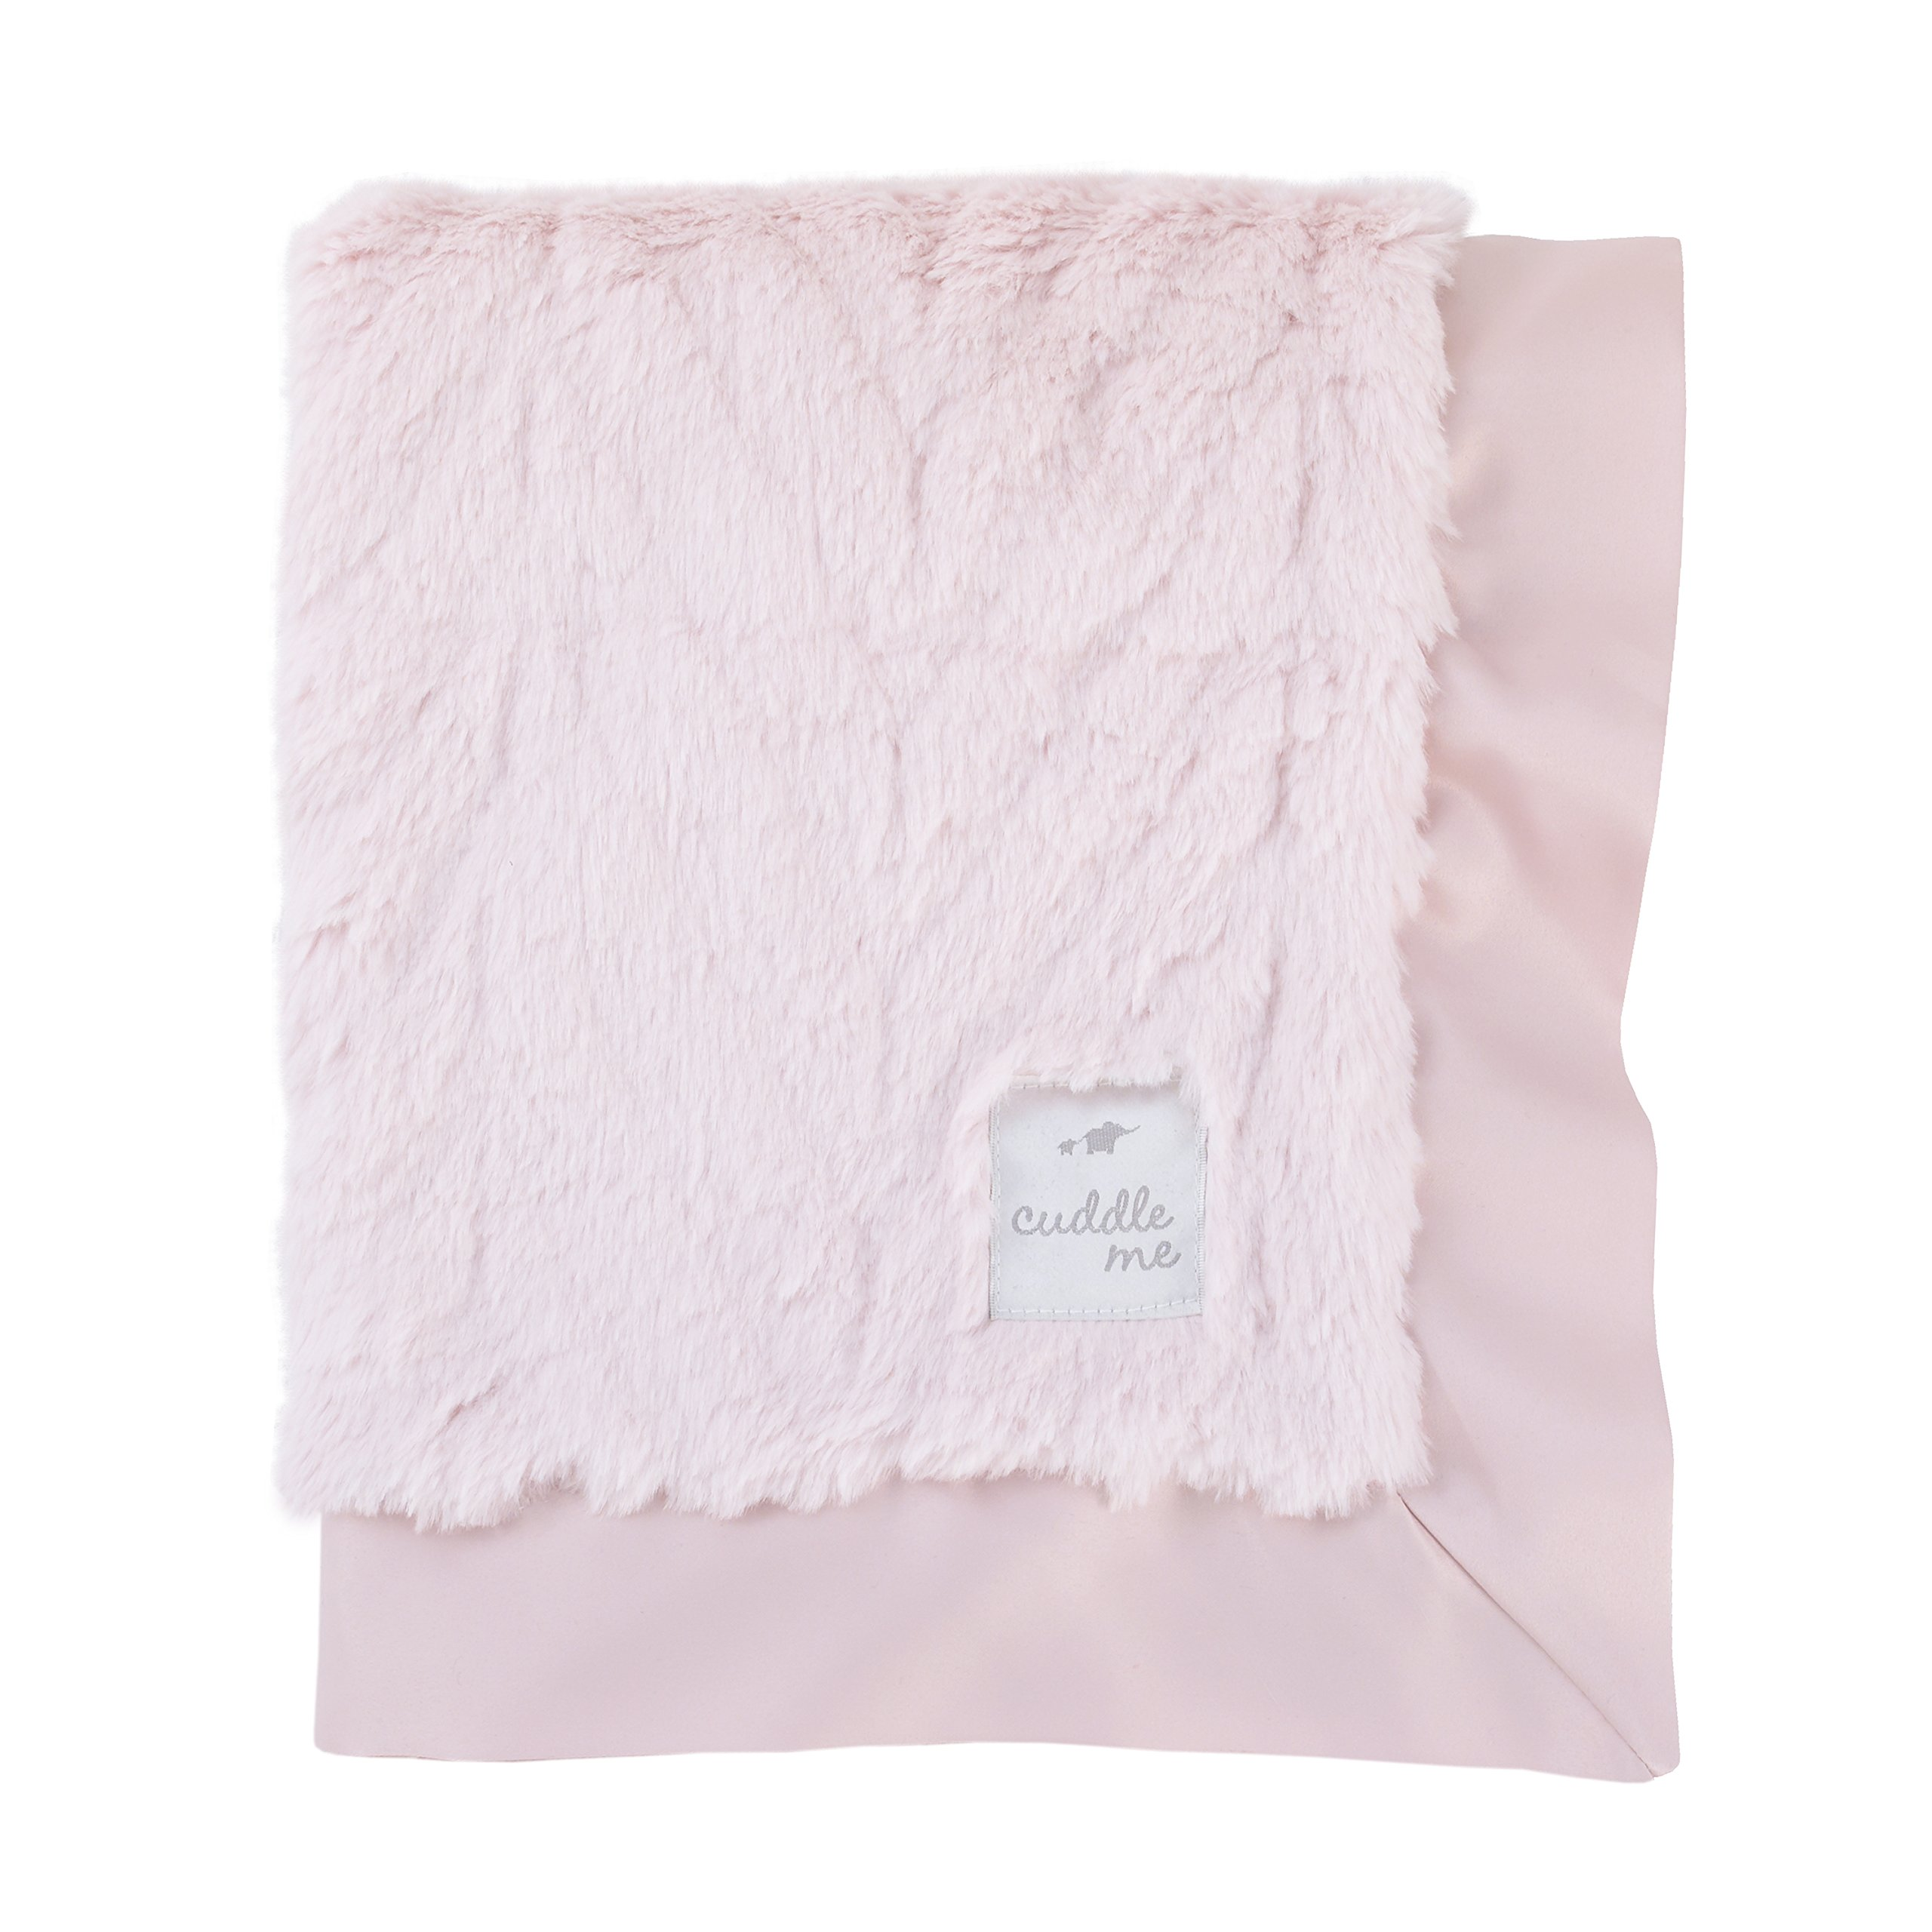 Cuddle Me Luxury Plush Chevron Blanket with Matte Satin Border, Pink by Cuddle Me